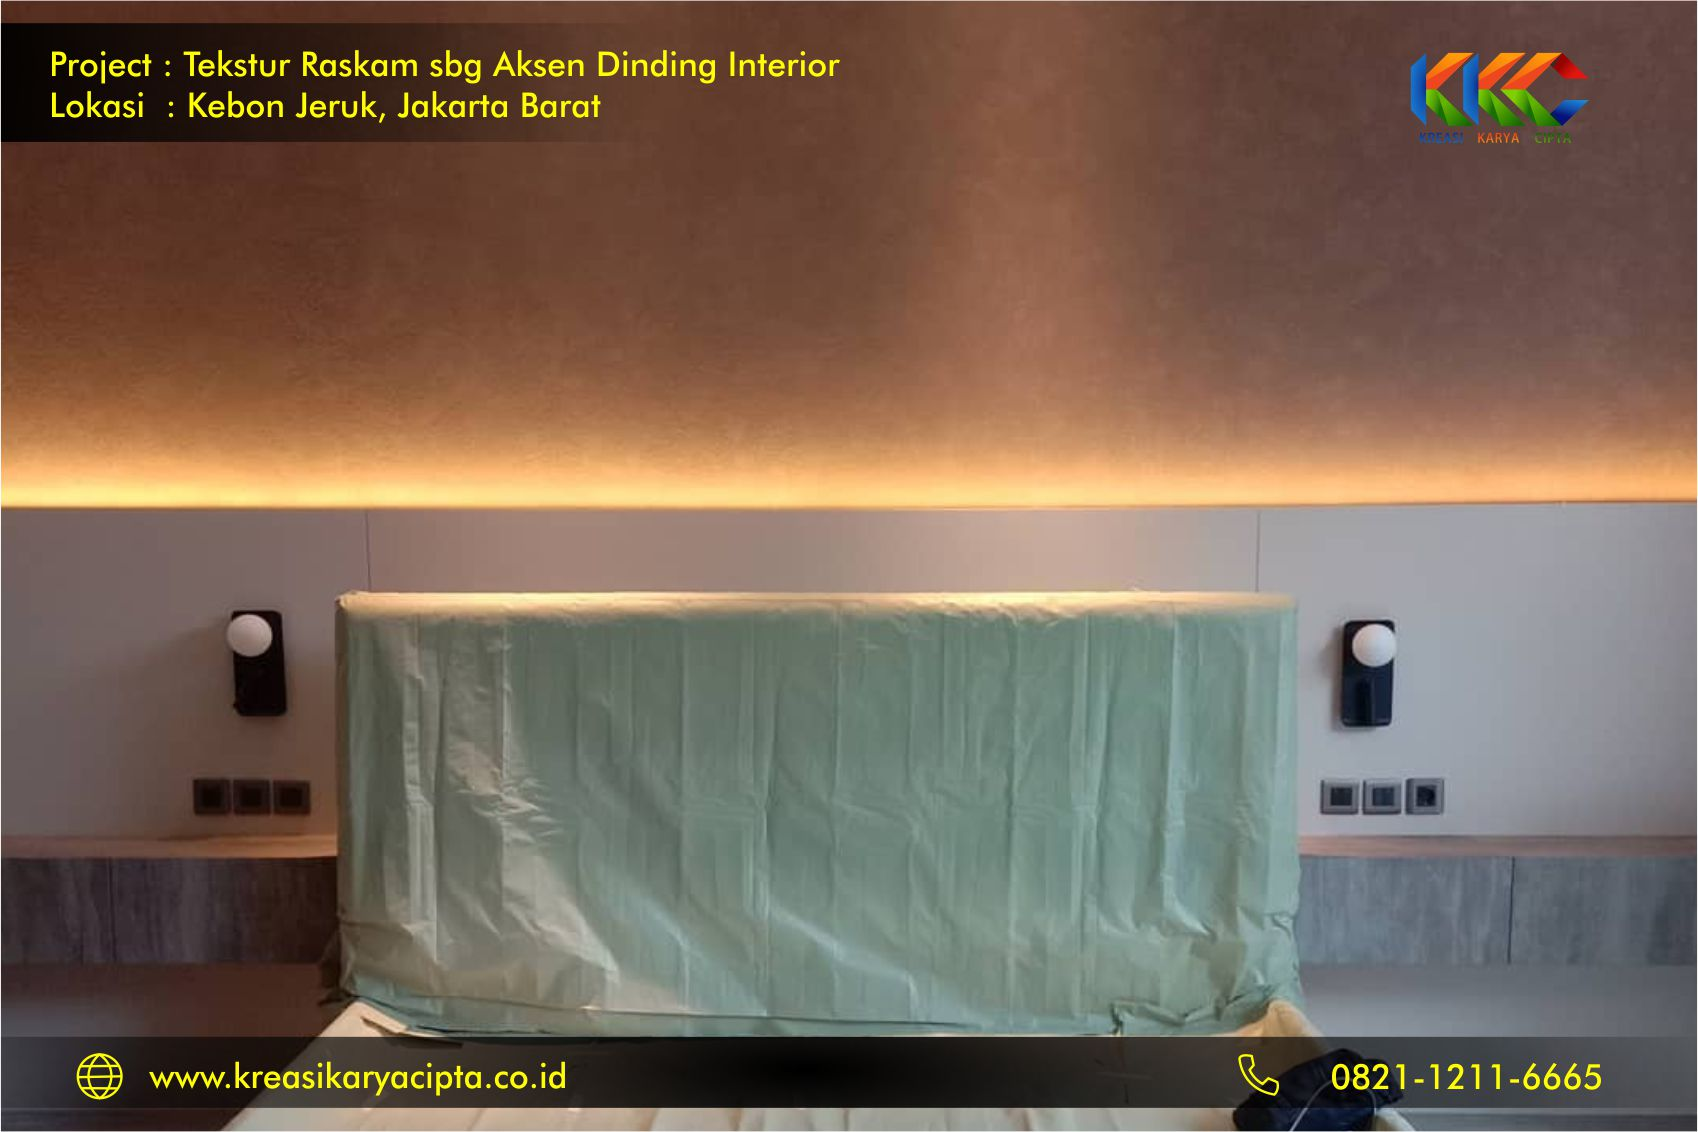 Project pengecatan Tekstur Raskam di Daerah Kebon Jeruk, Jakarta Barat